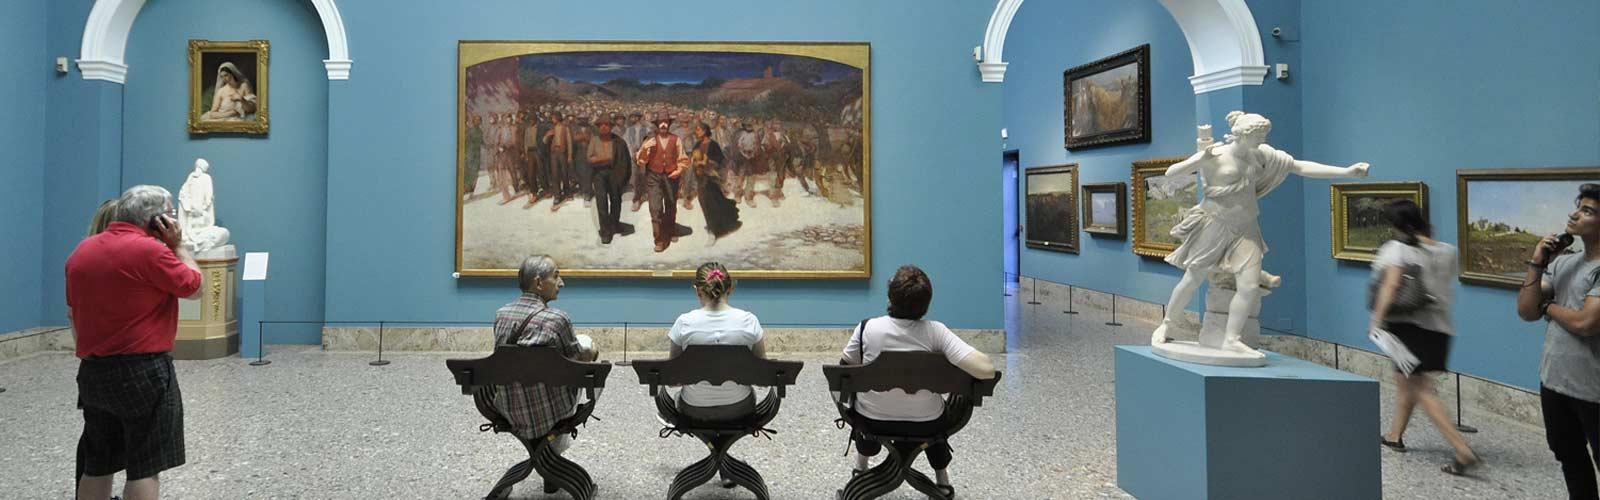 Amateur Photographs in the Pinacoteca